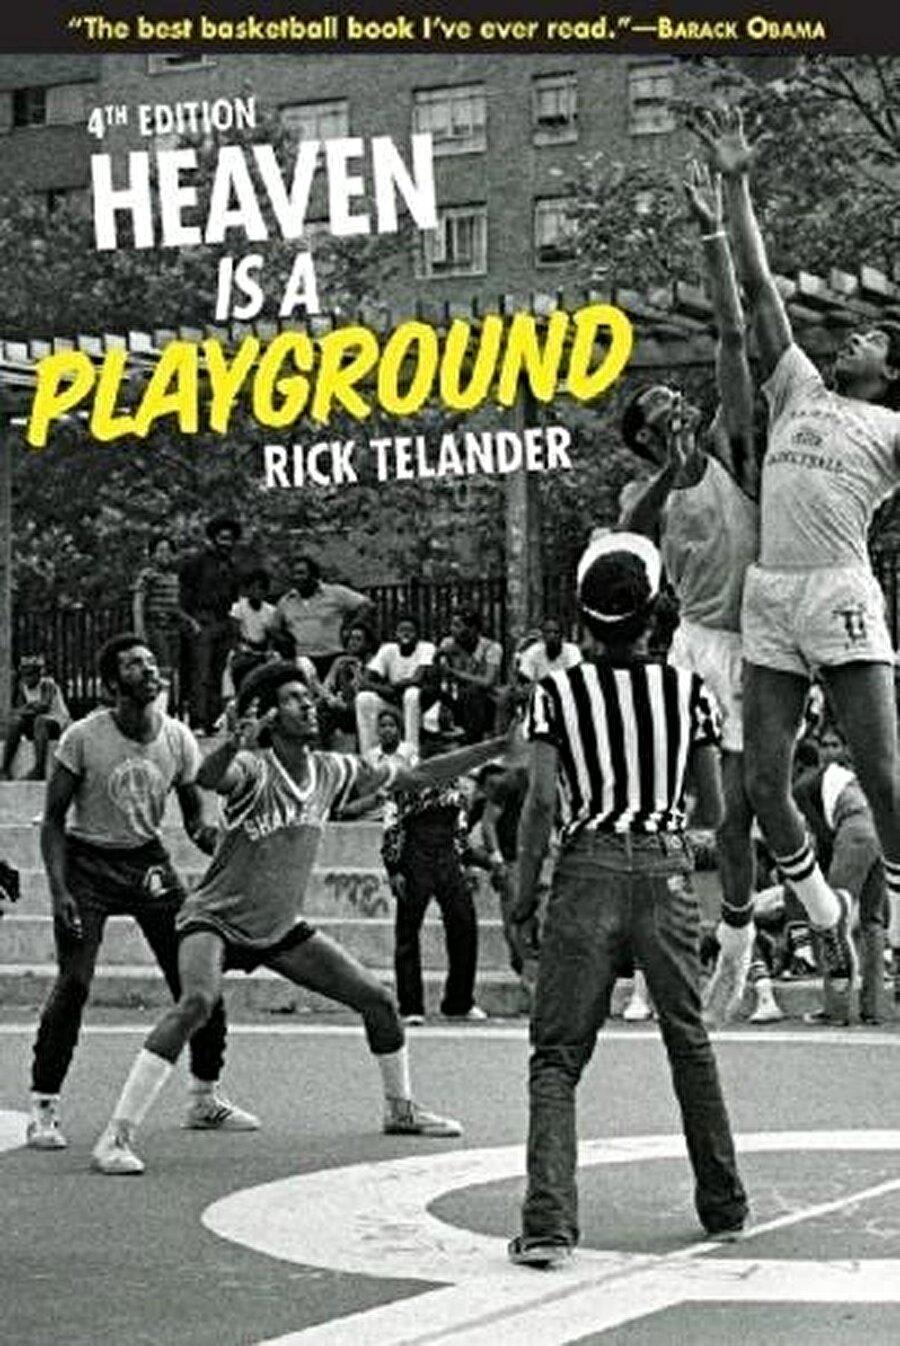 HEAVEN IS A PLAYGROUND: Rick Telander